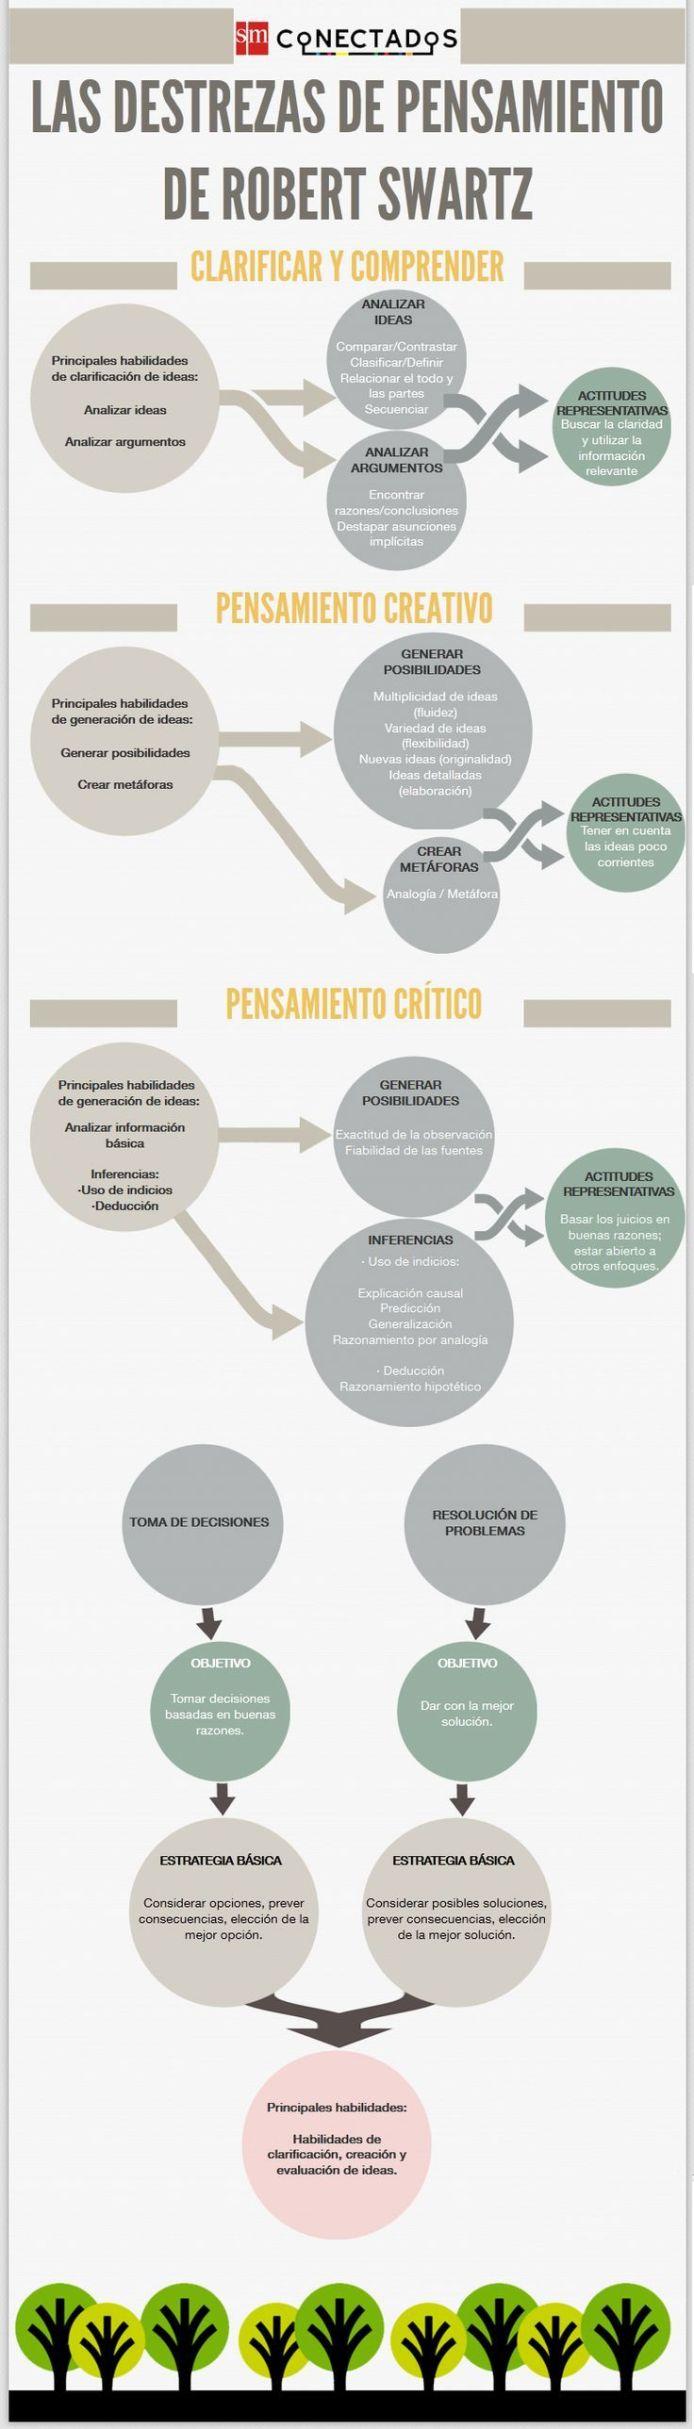 Las3DestrezasPensamientoRobertSwartz-Infografía-BlogGesvin